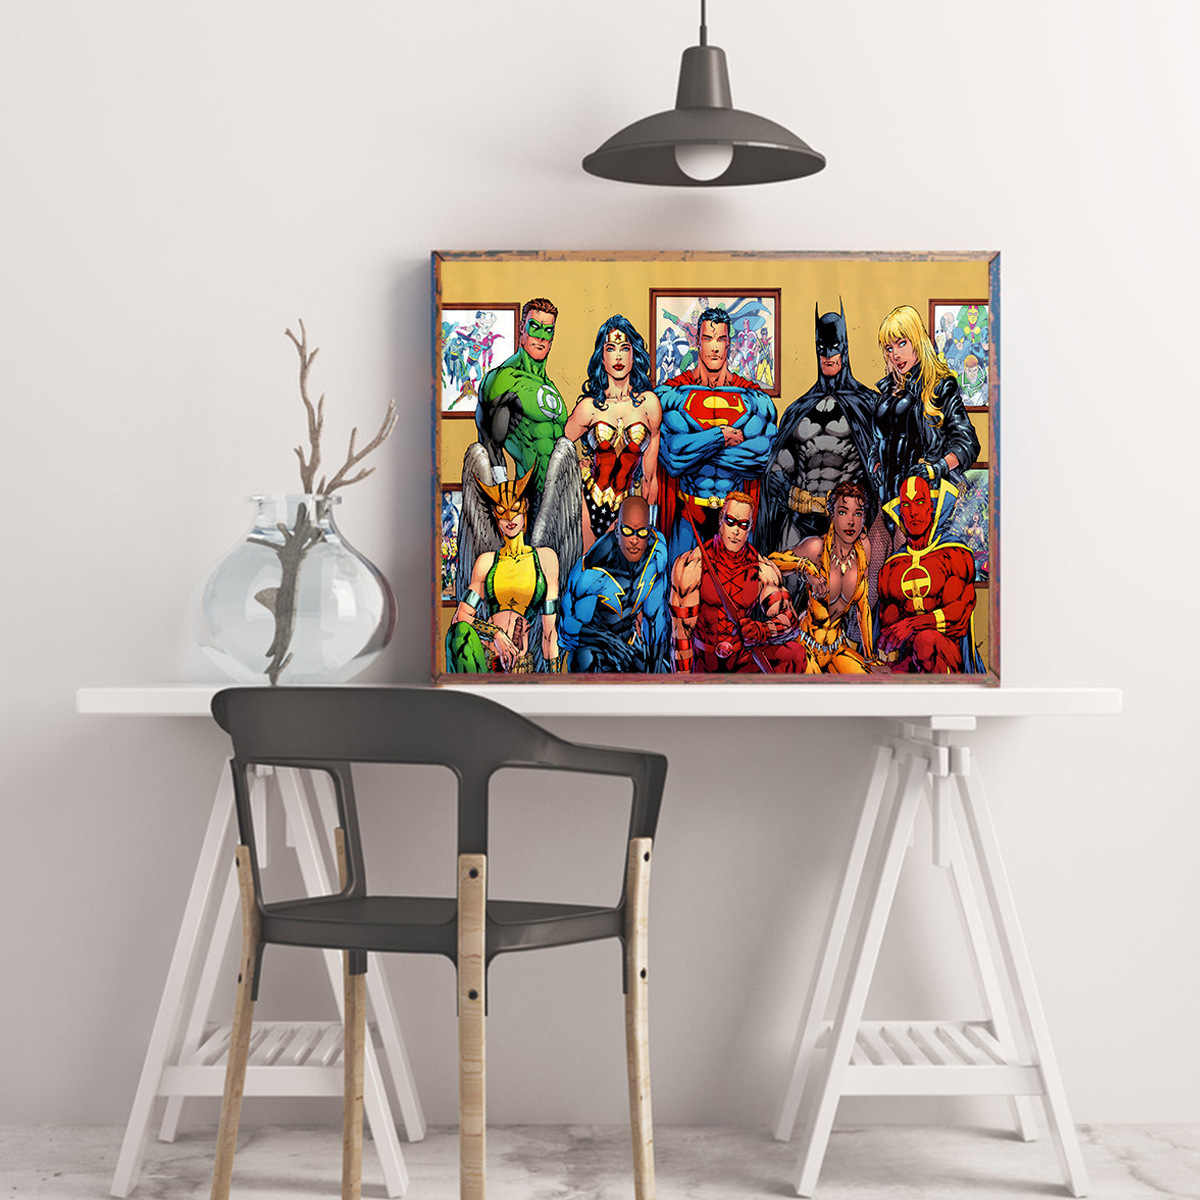 Marvel Wall Art Batman Superman Wonder Woman komiks bohater dekoracja wnętrz Cuadros Decoracion Salon plakaty i druki malarstwo